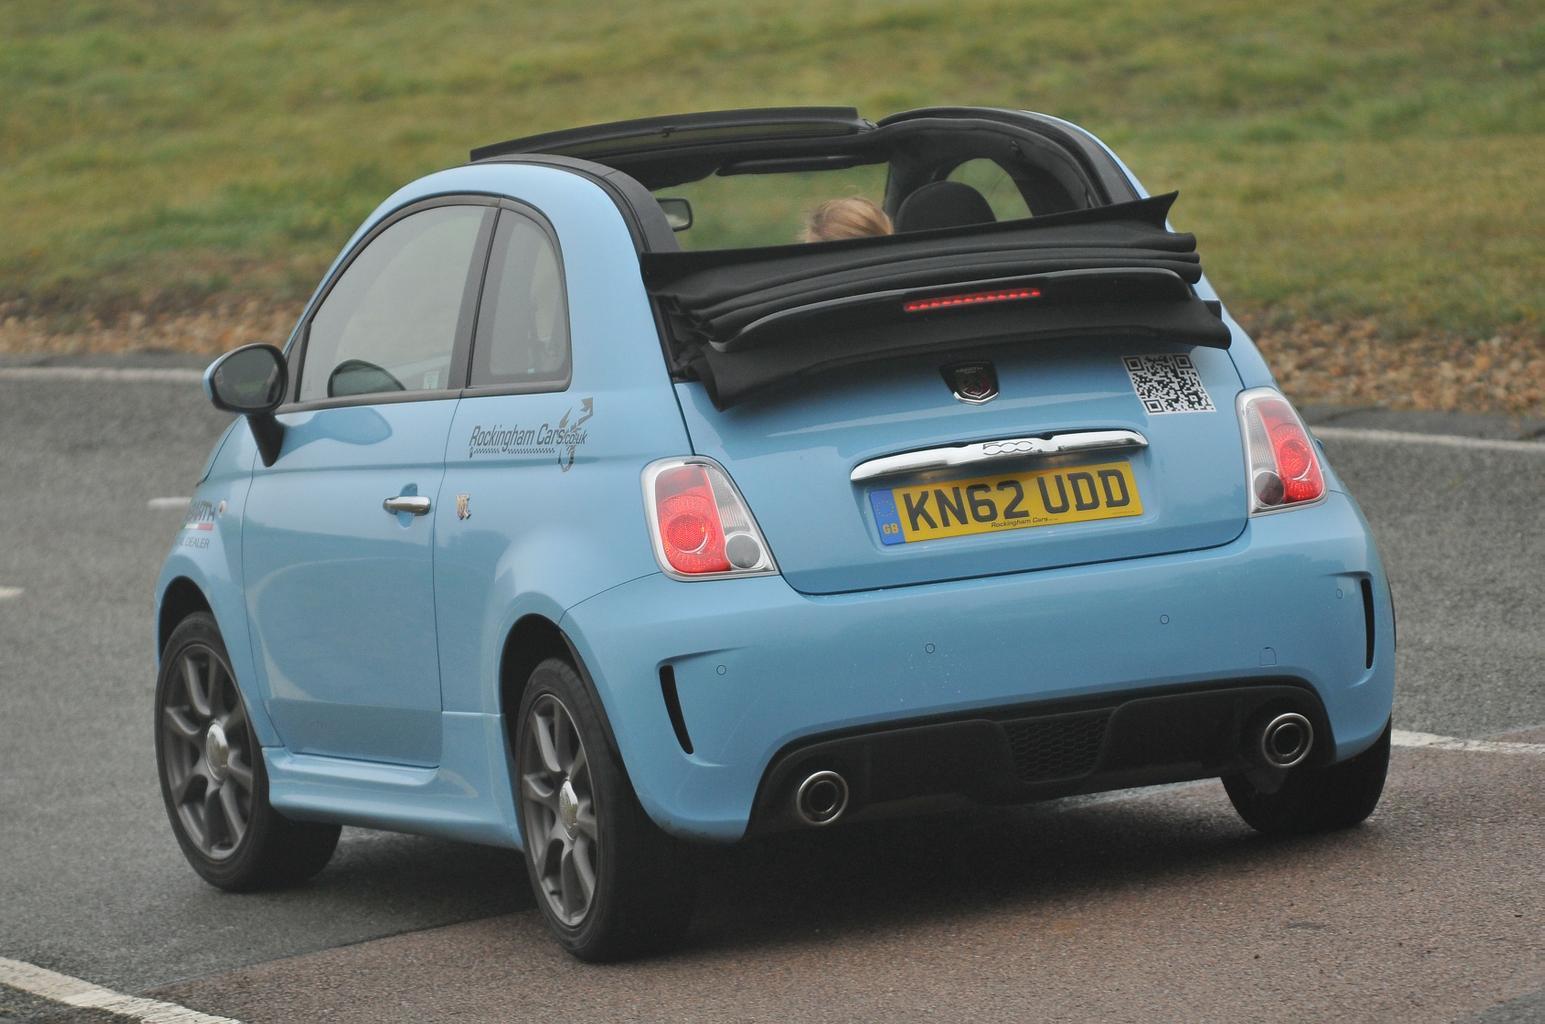 Used test – chic convertibles: Citroen DS3 Cabrio vs Fiat 500C